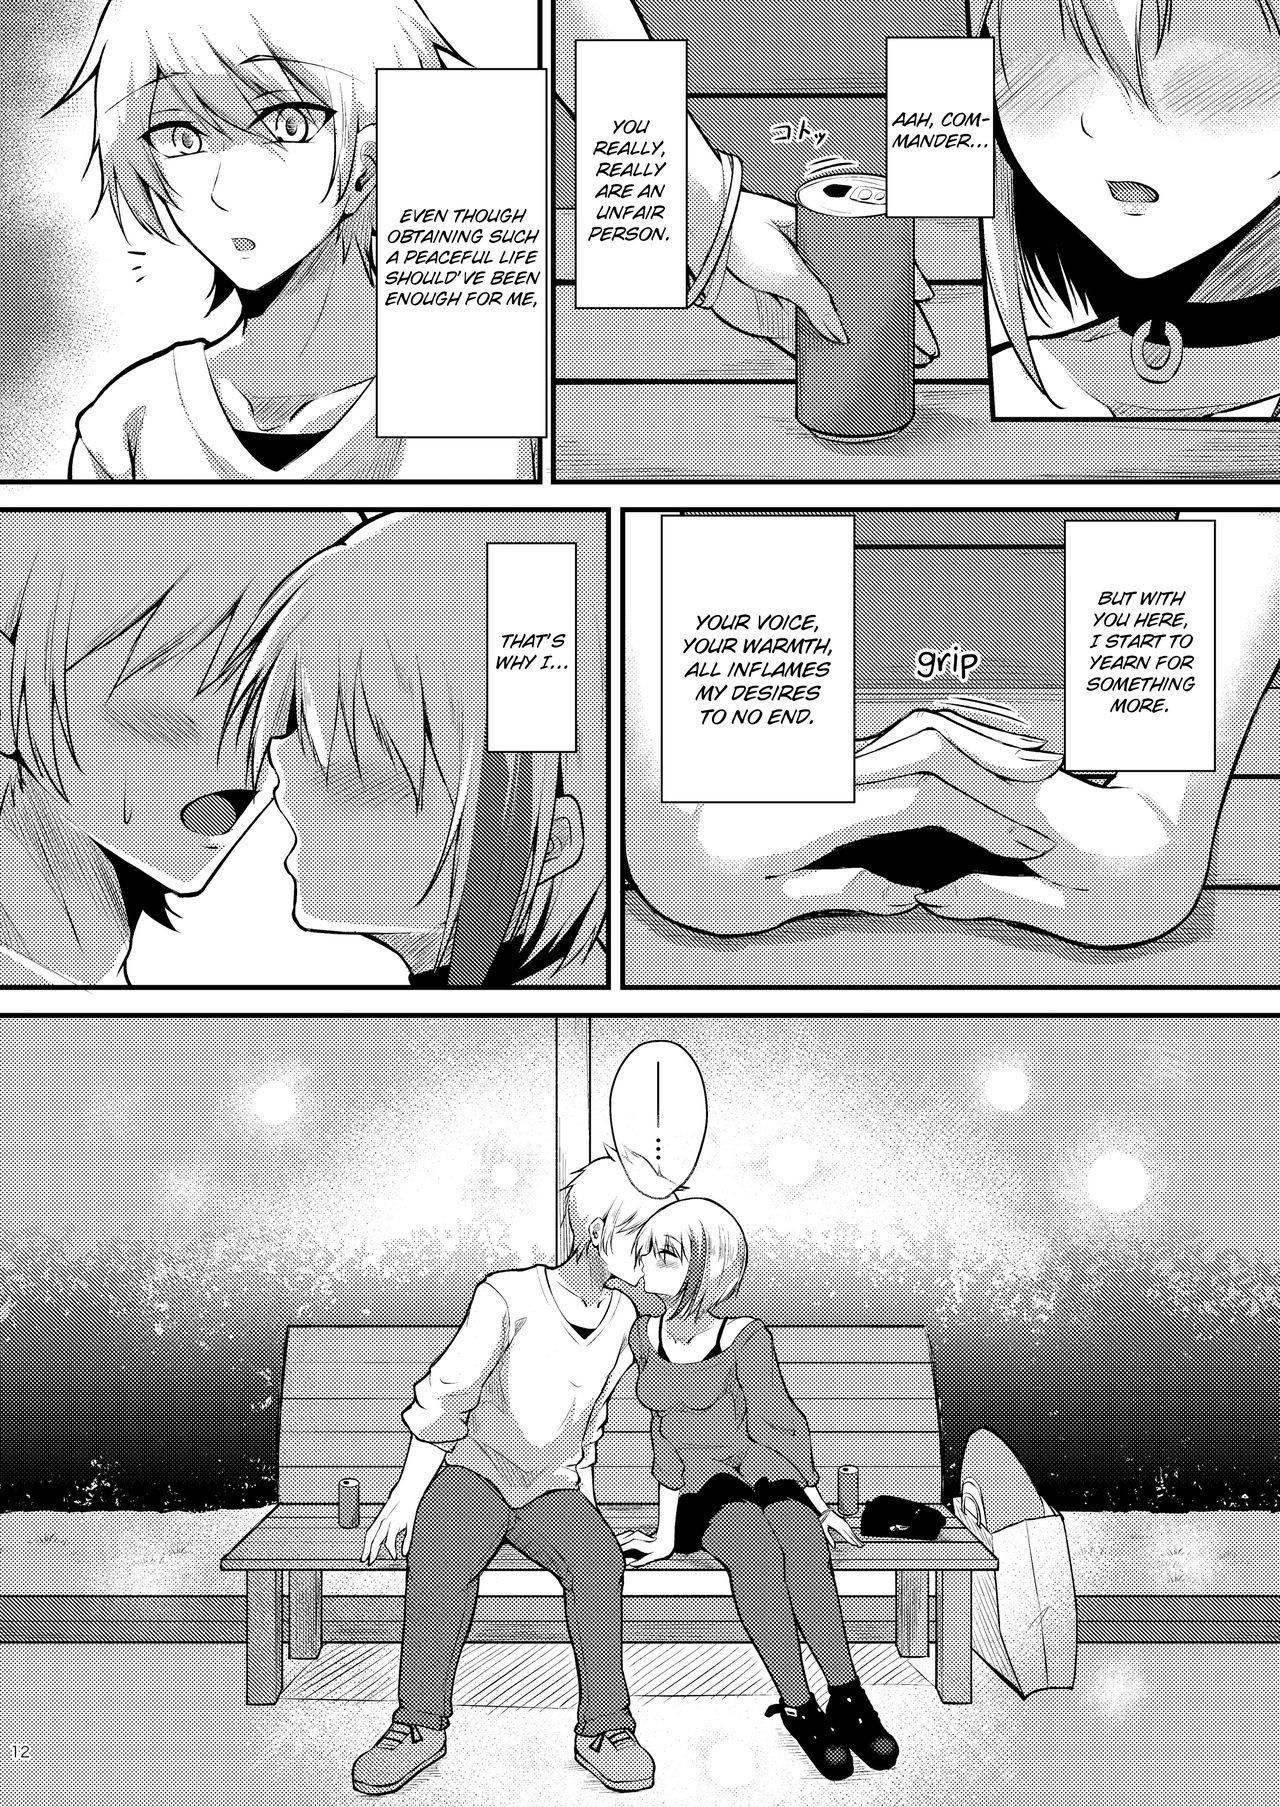 Afureru Kurai, Kimi ga Suki.   I love you so much, that I can't contain it 12